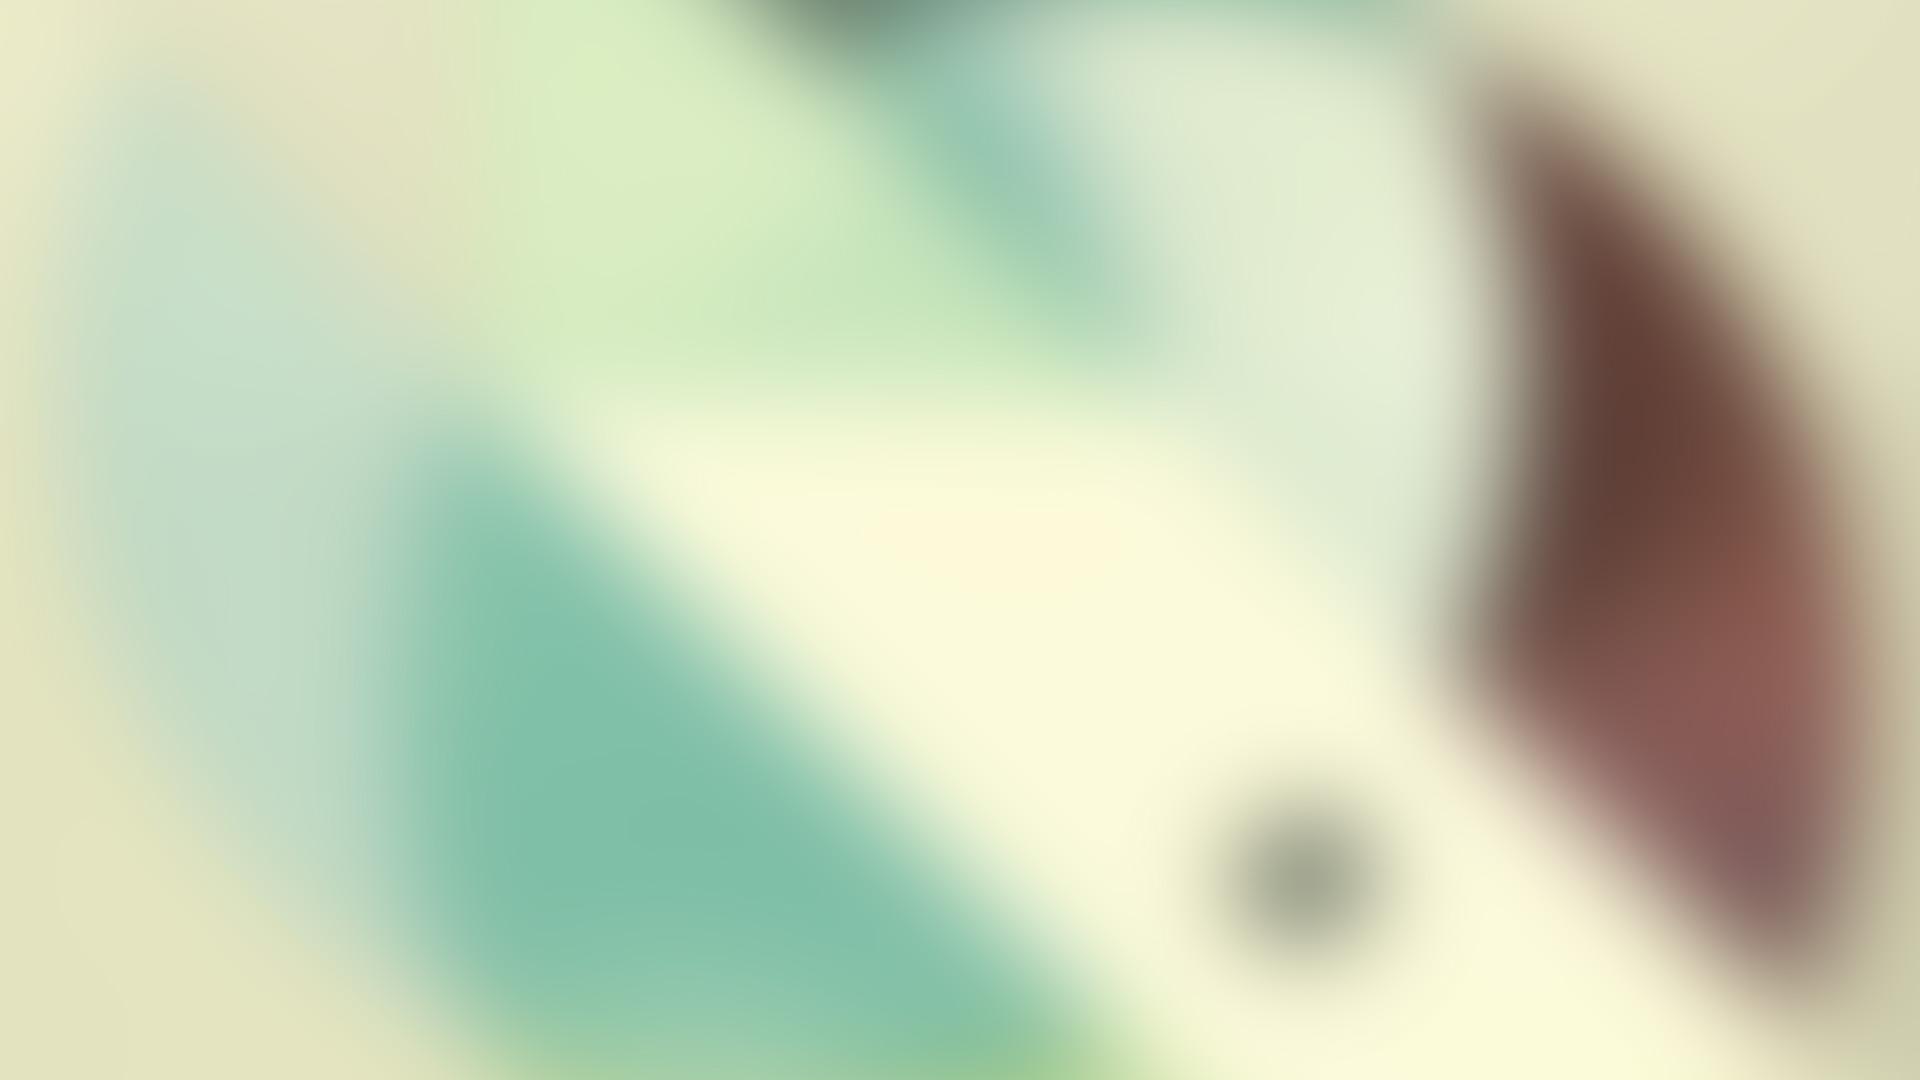 Mobilee227_Moo&Jo_Munuli_bg-blur